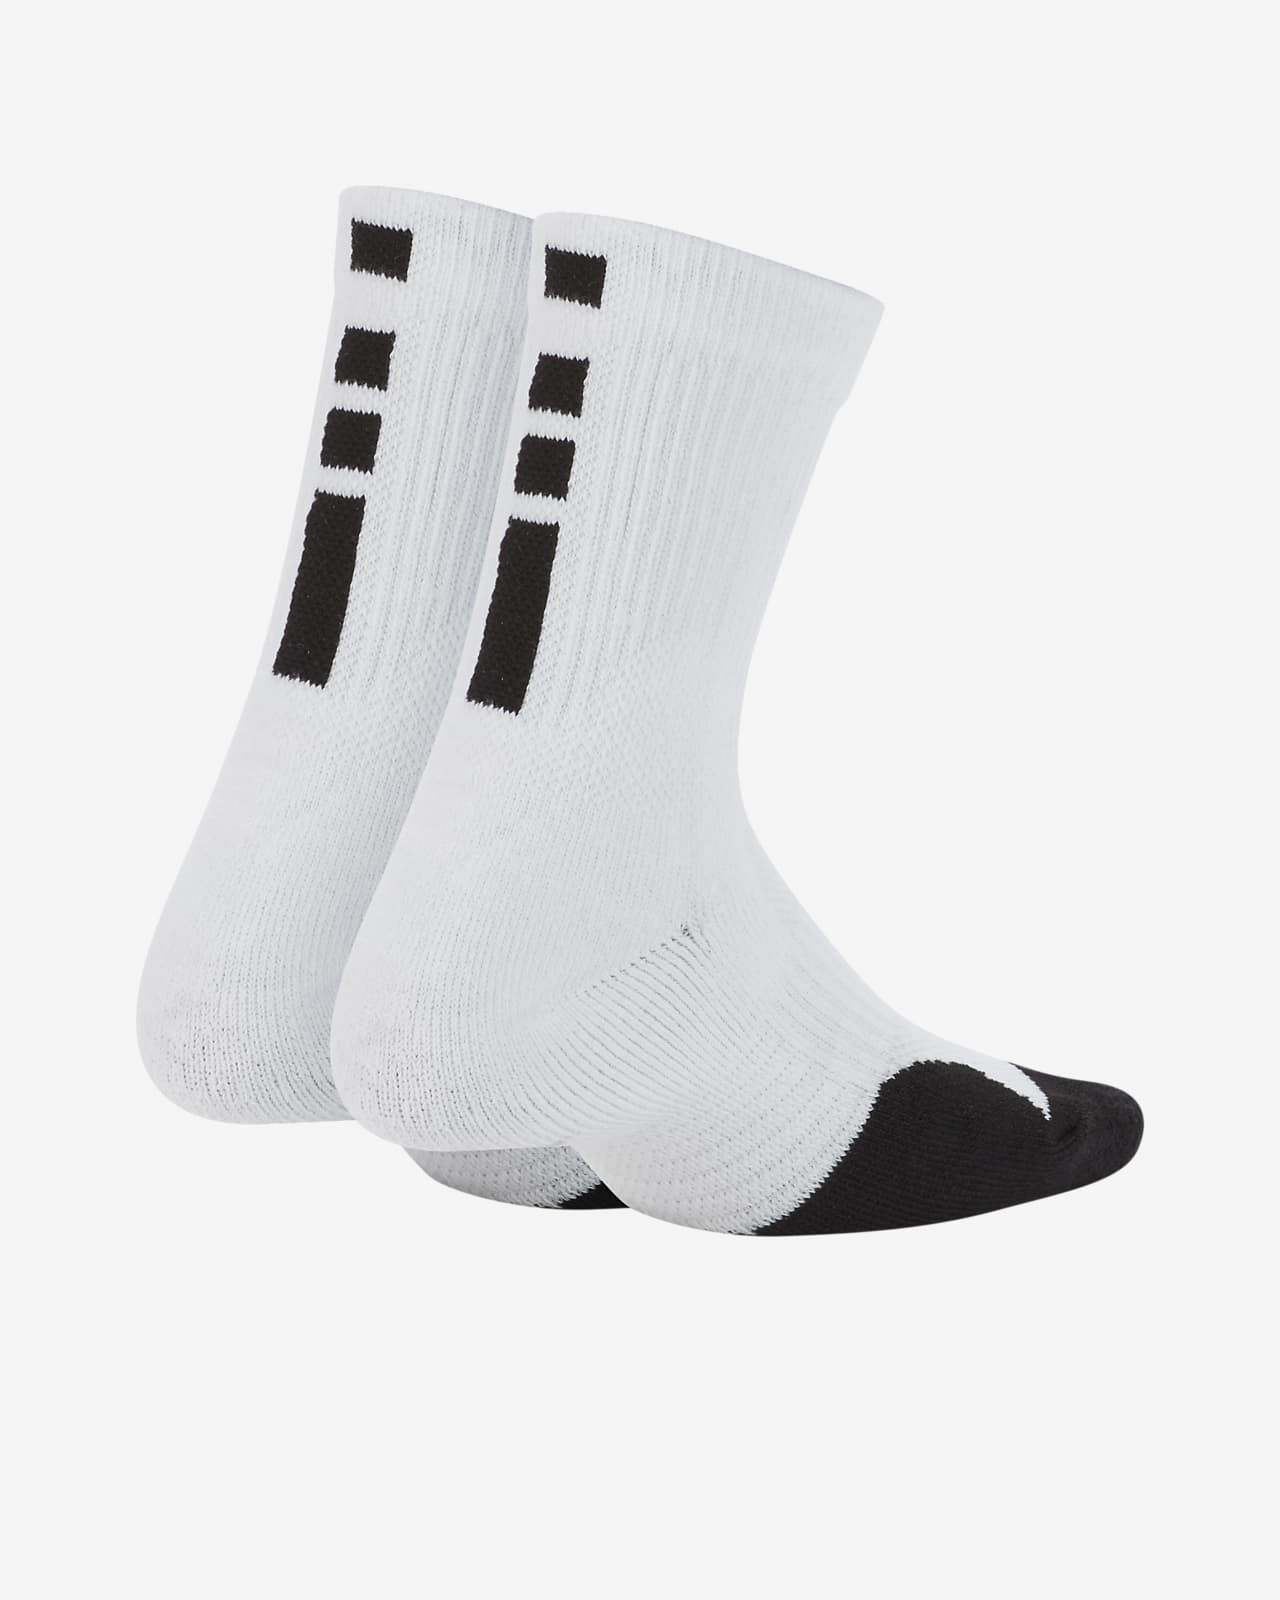 Nike Dri-FIT Elite Little Kids' Crew Socks (2 Pairs)